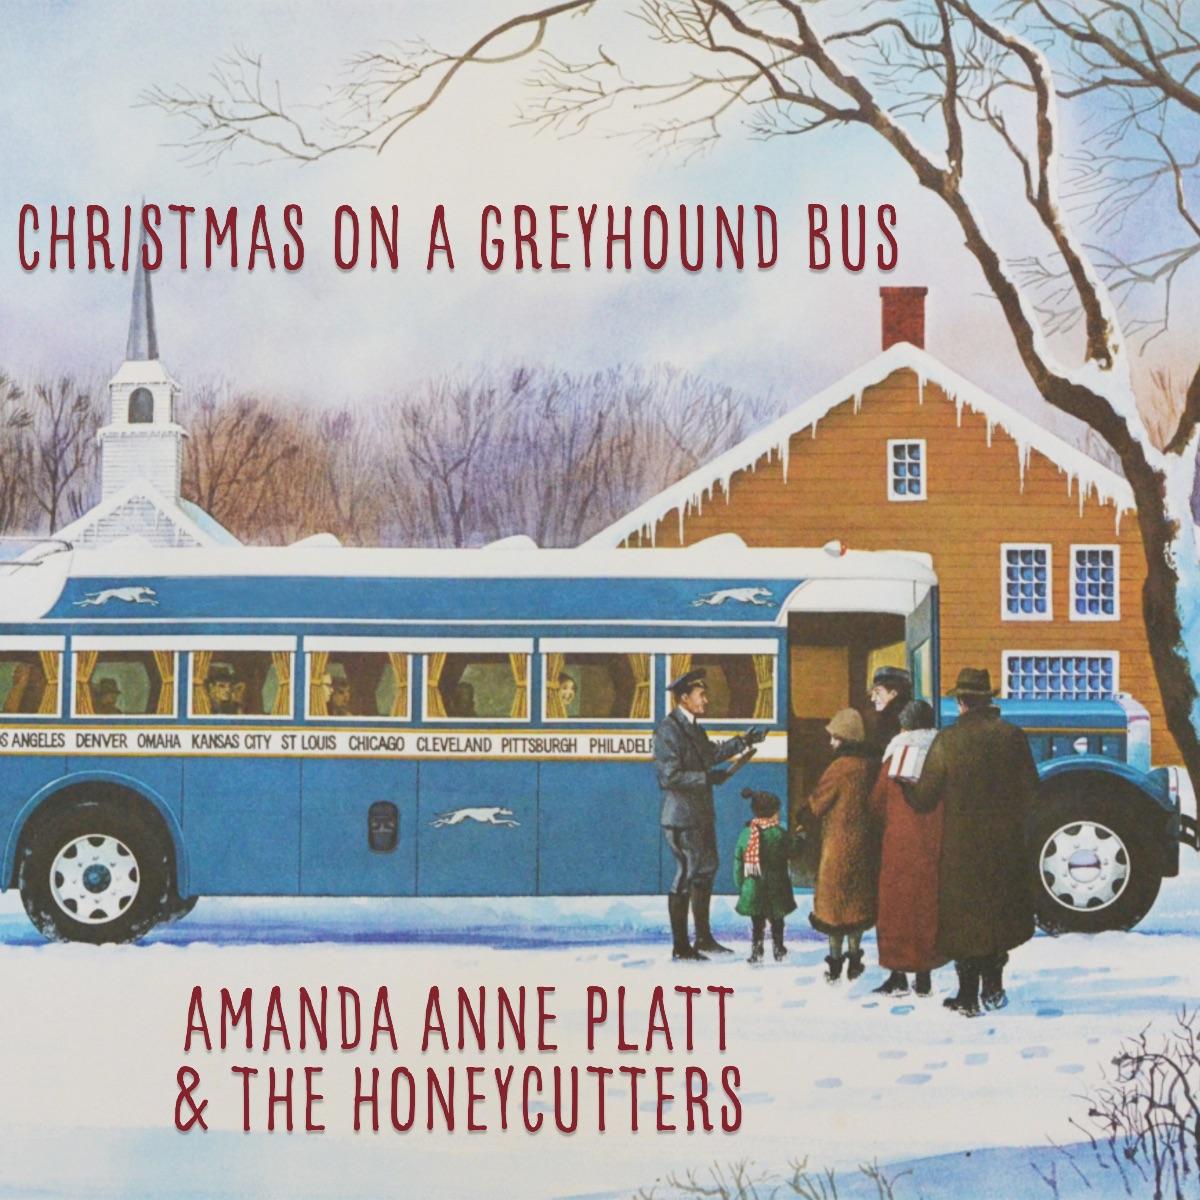 amanda-anne-platt-christmas